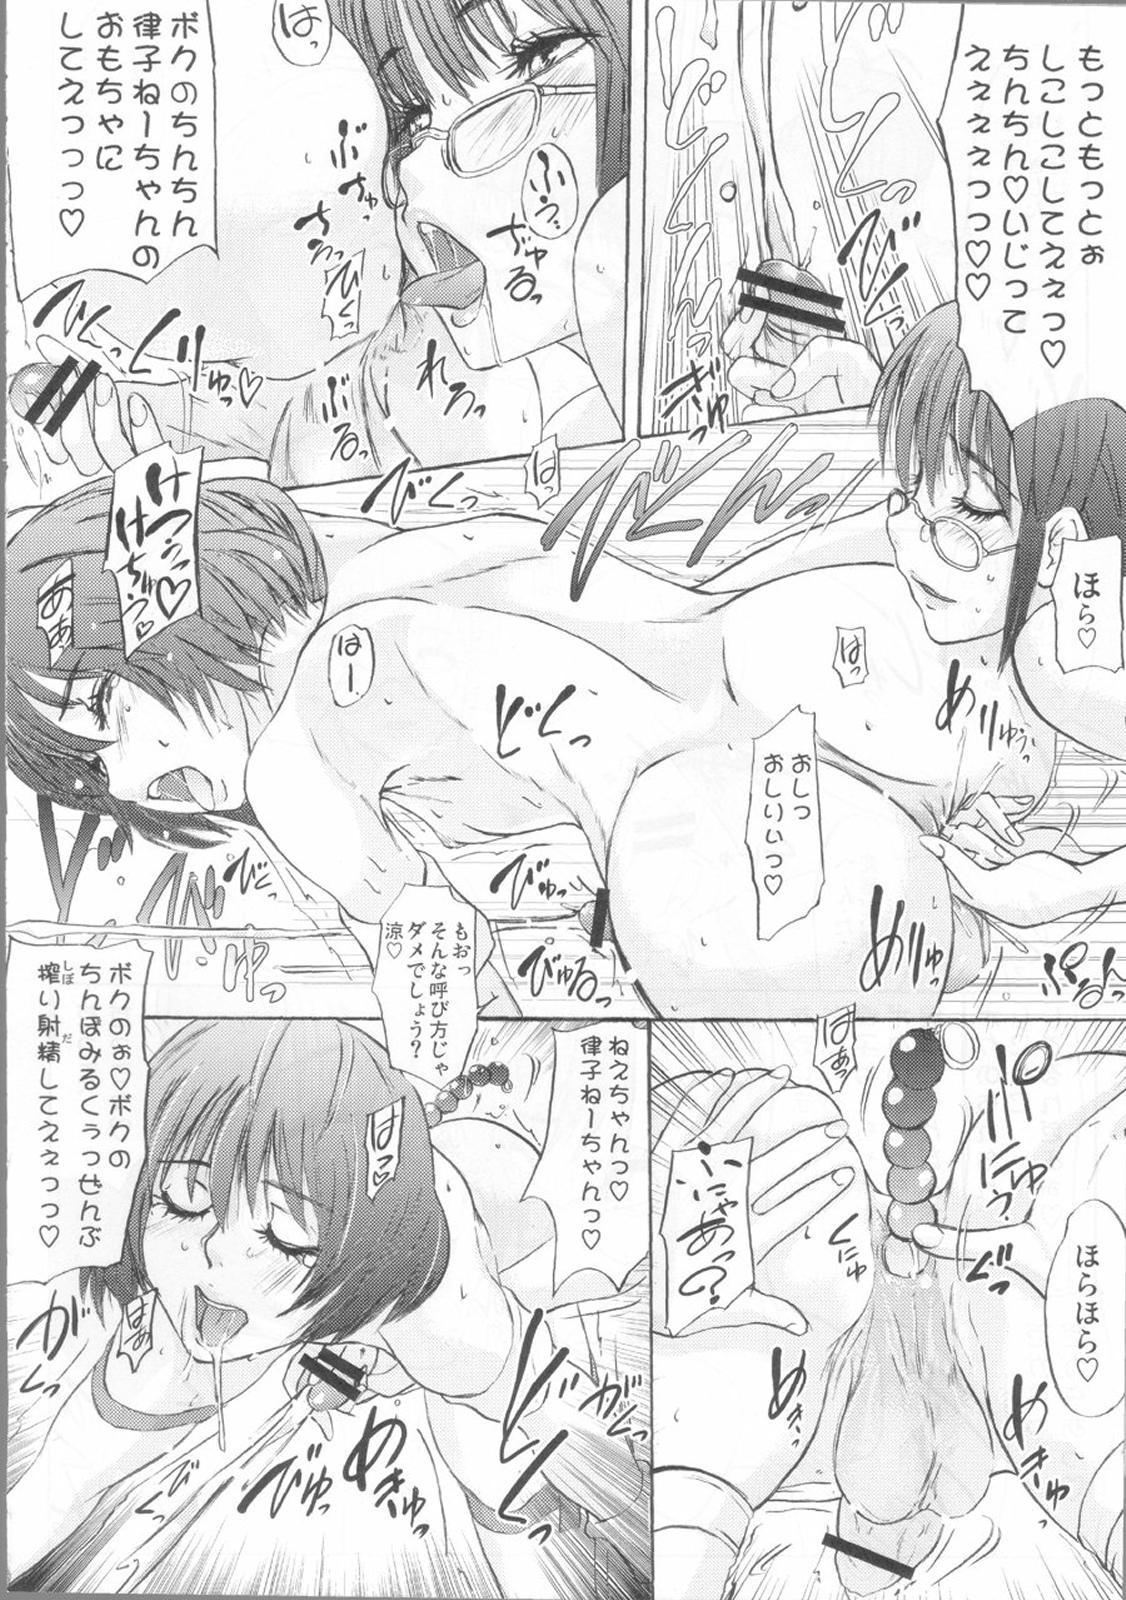 Kaikin!! Oh! tin tin Idol - Ryo's squirt show 14